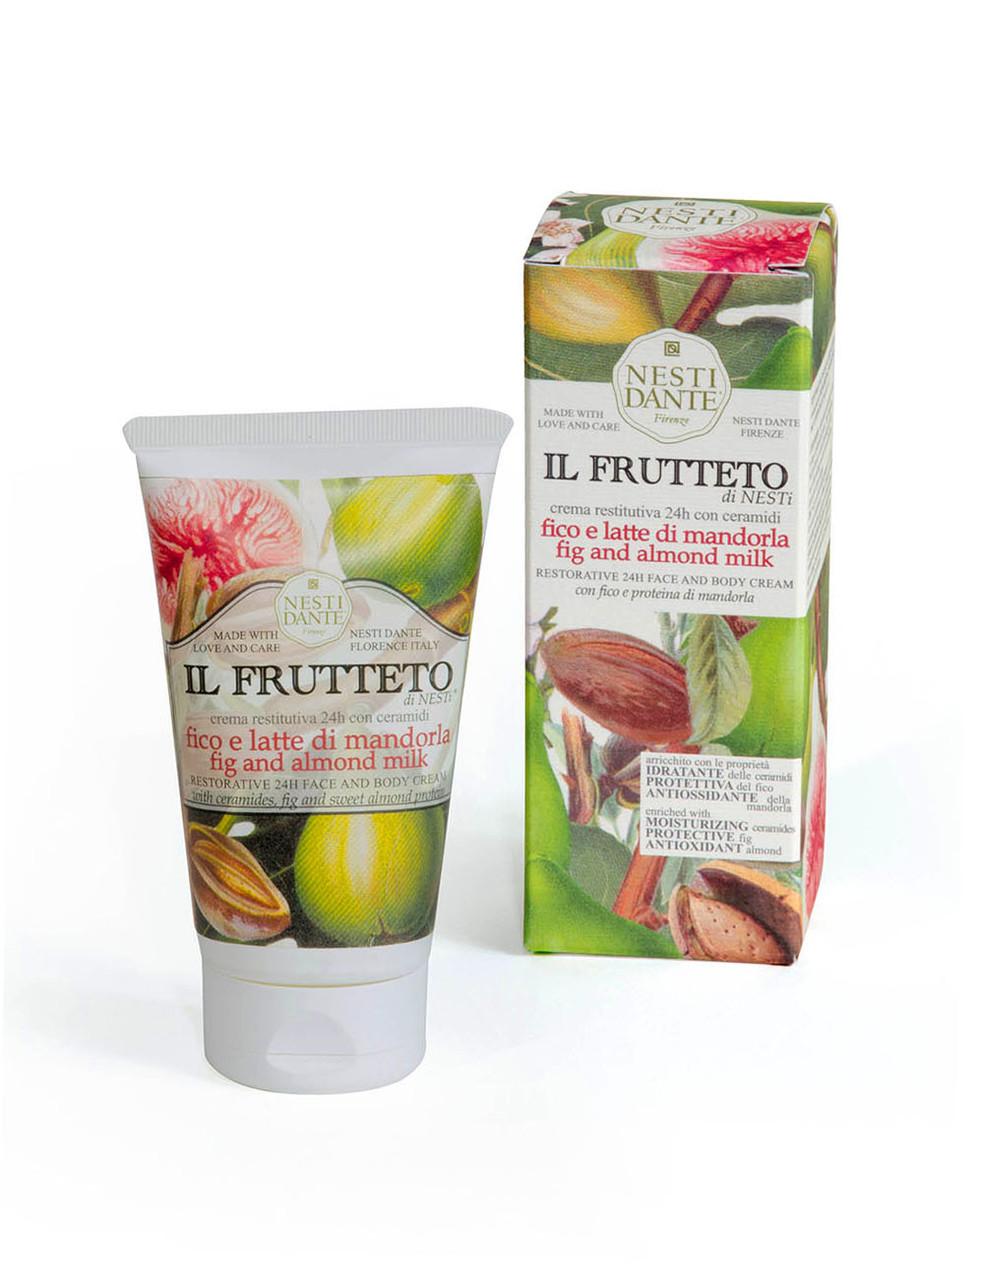 Крем Nesti Dante увлажняющий Il Frutteto Fico, Latte di Mandorla Инжир и Миндальное молочко 150г